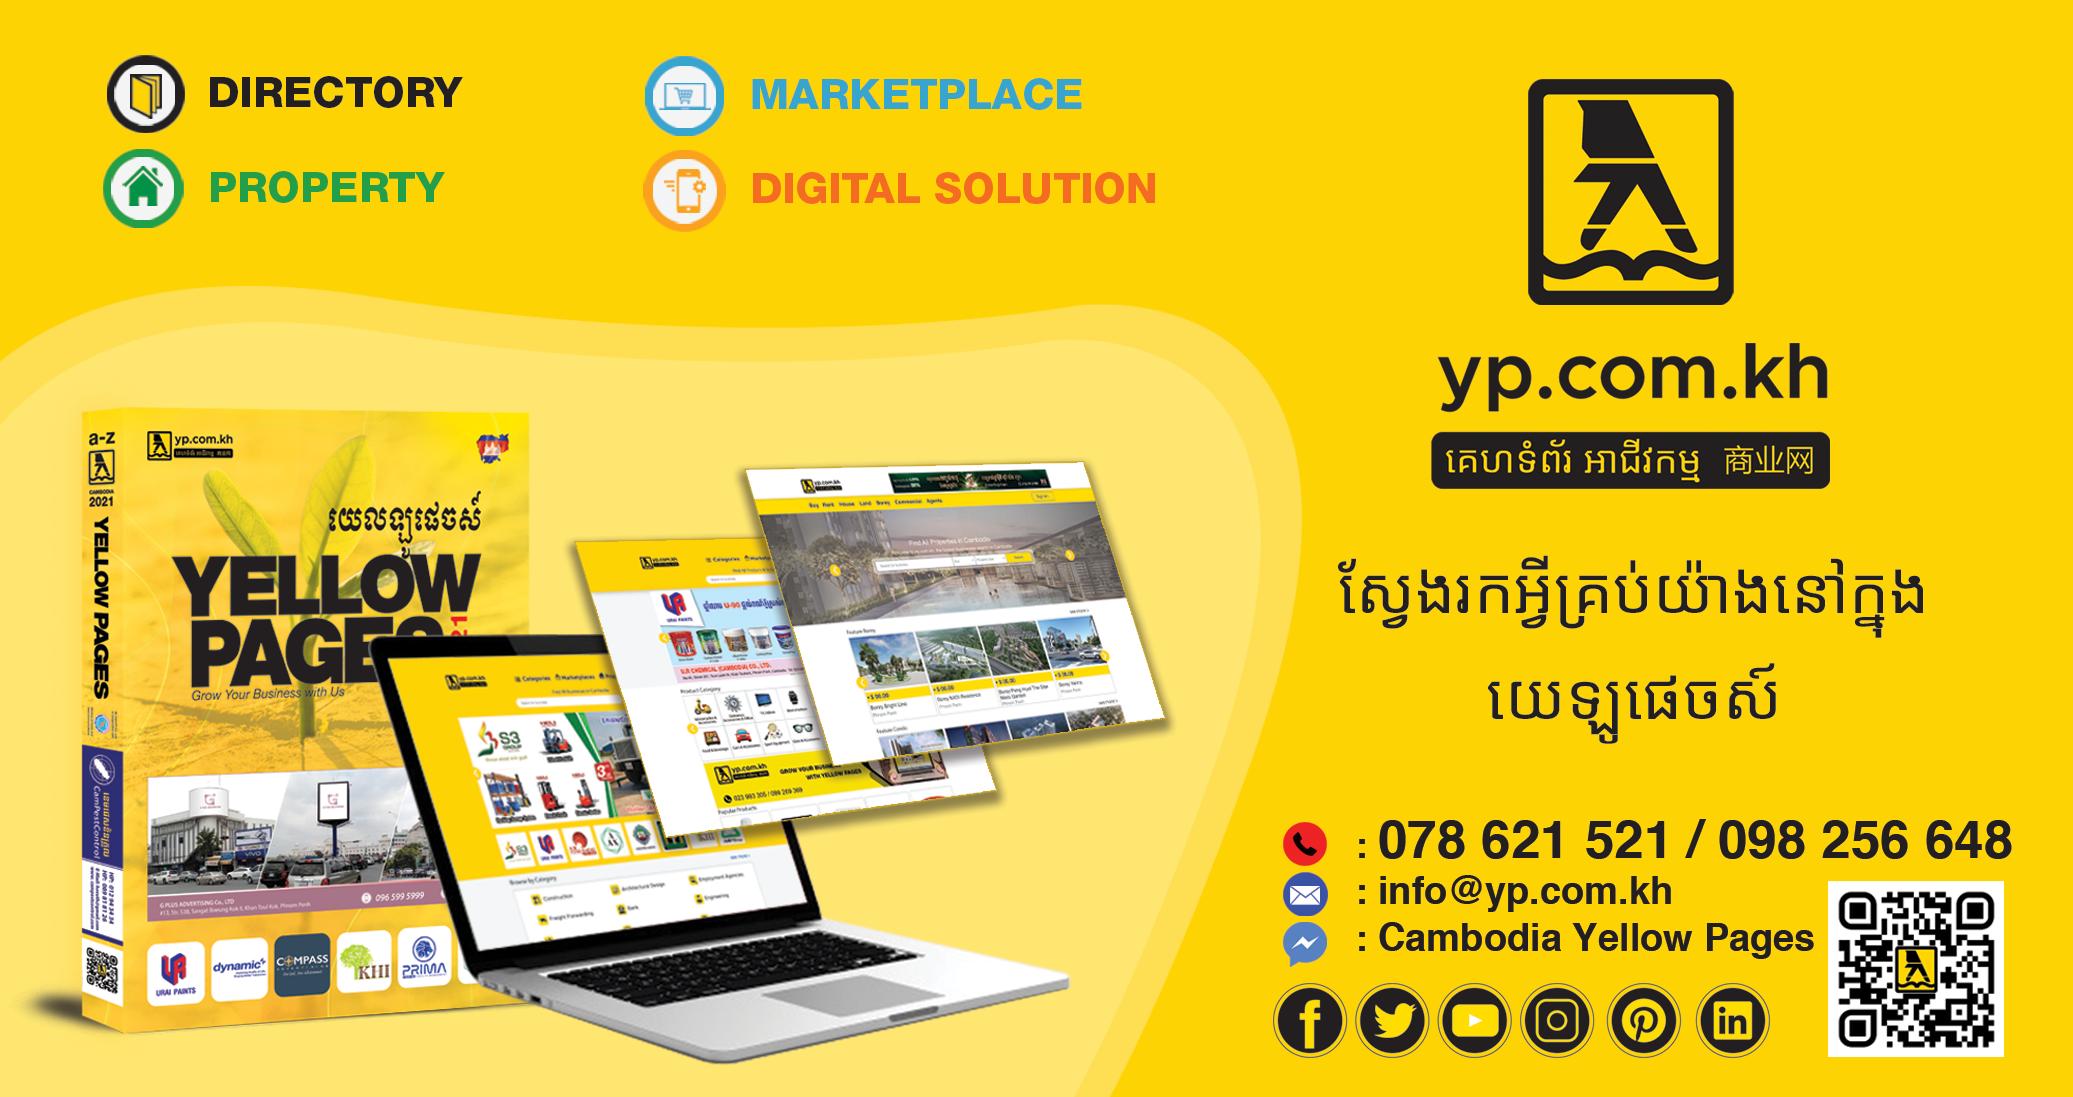 Latest job search information in Cambodia